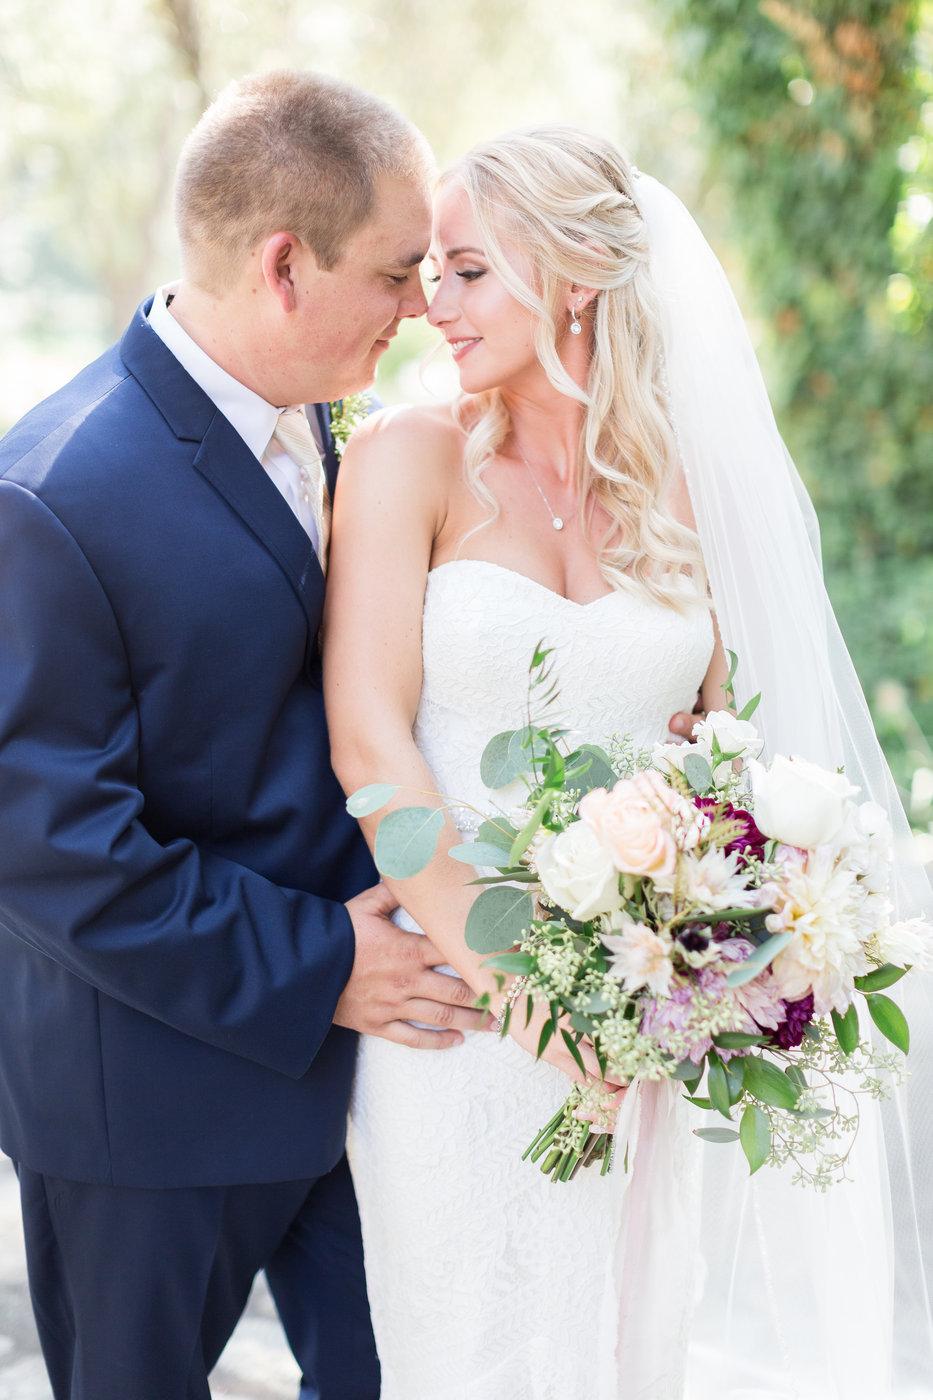 wedding-photos-from-centerville-estates-wedding-photographer.jpg